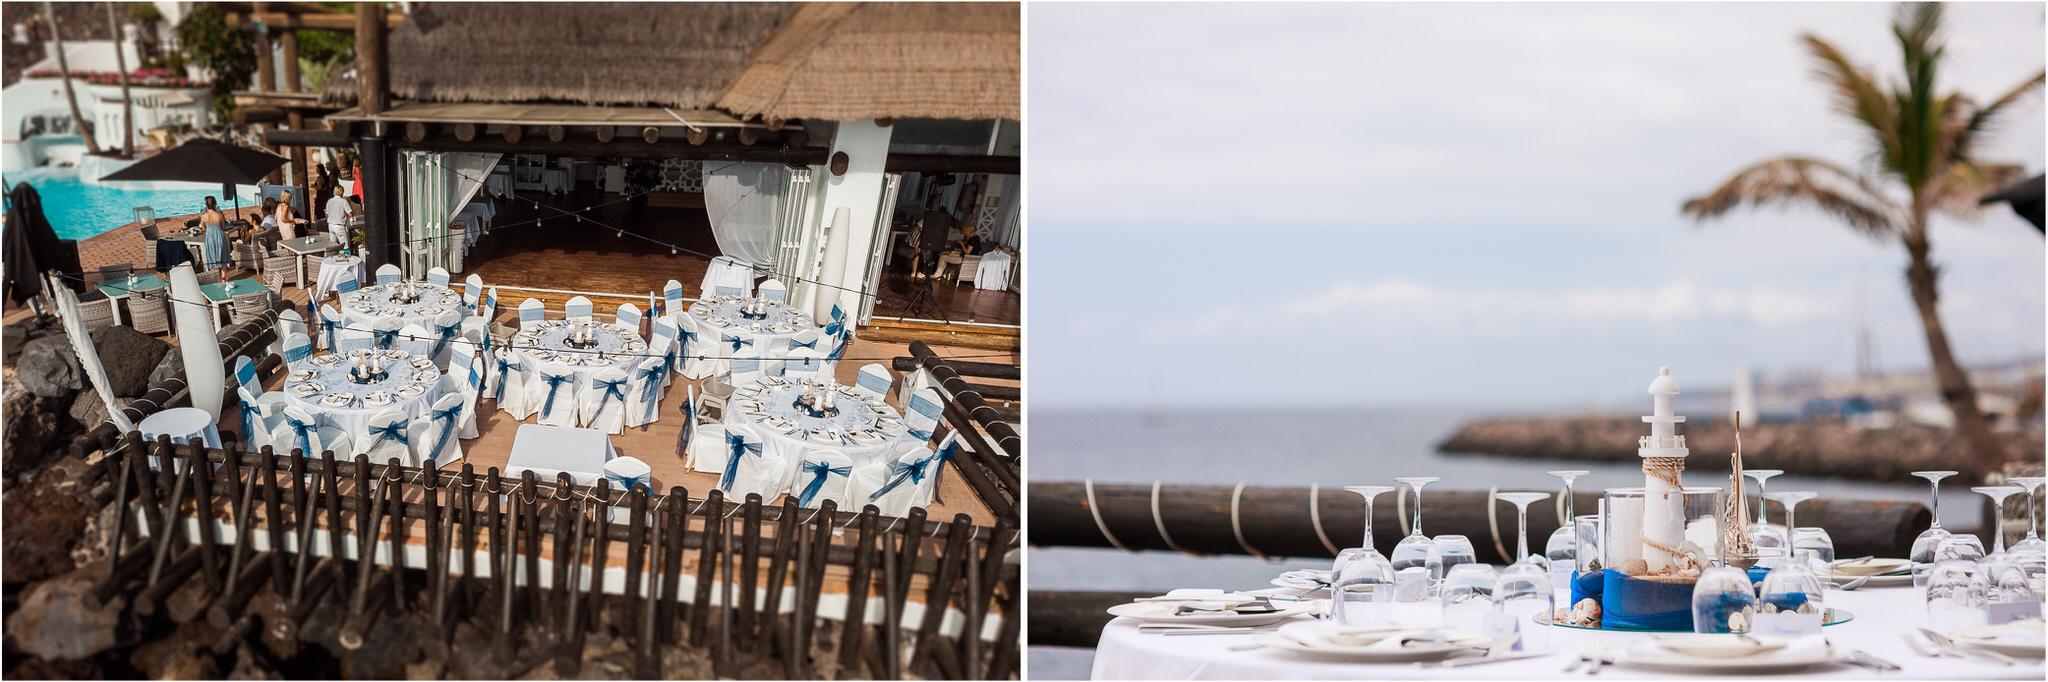 Hochzeitsfoto-Teneriffa-18.jpg